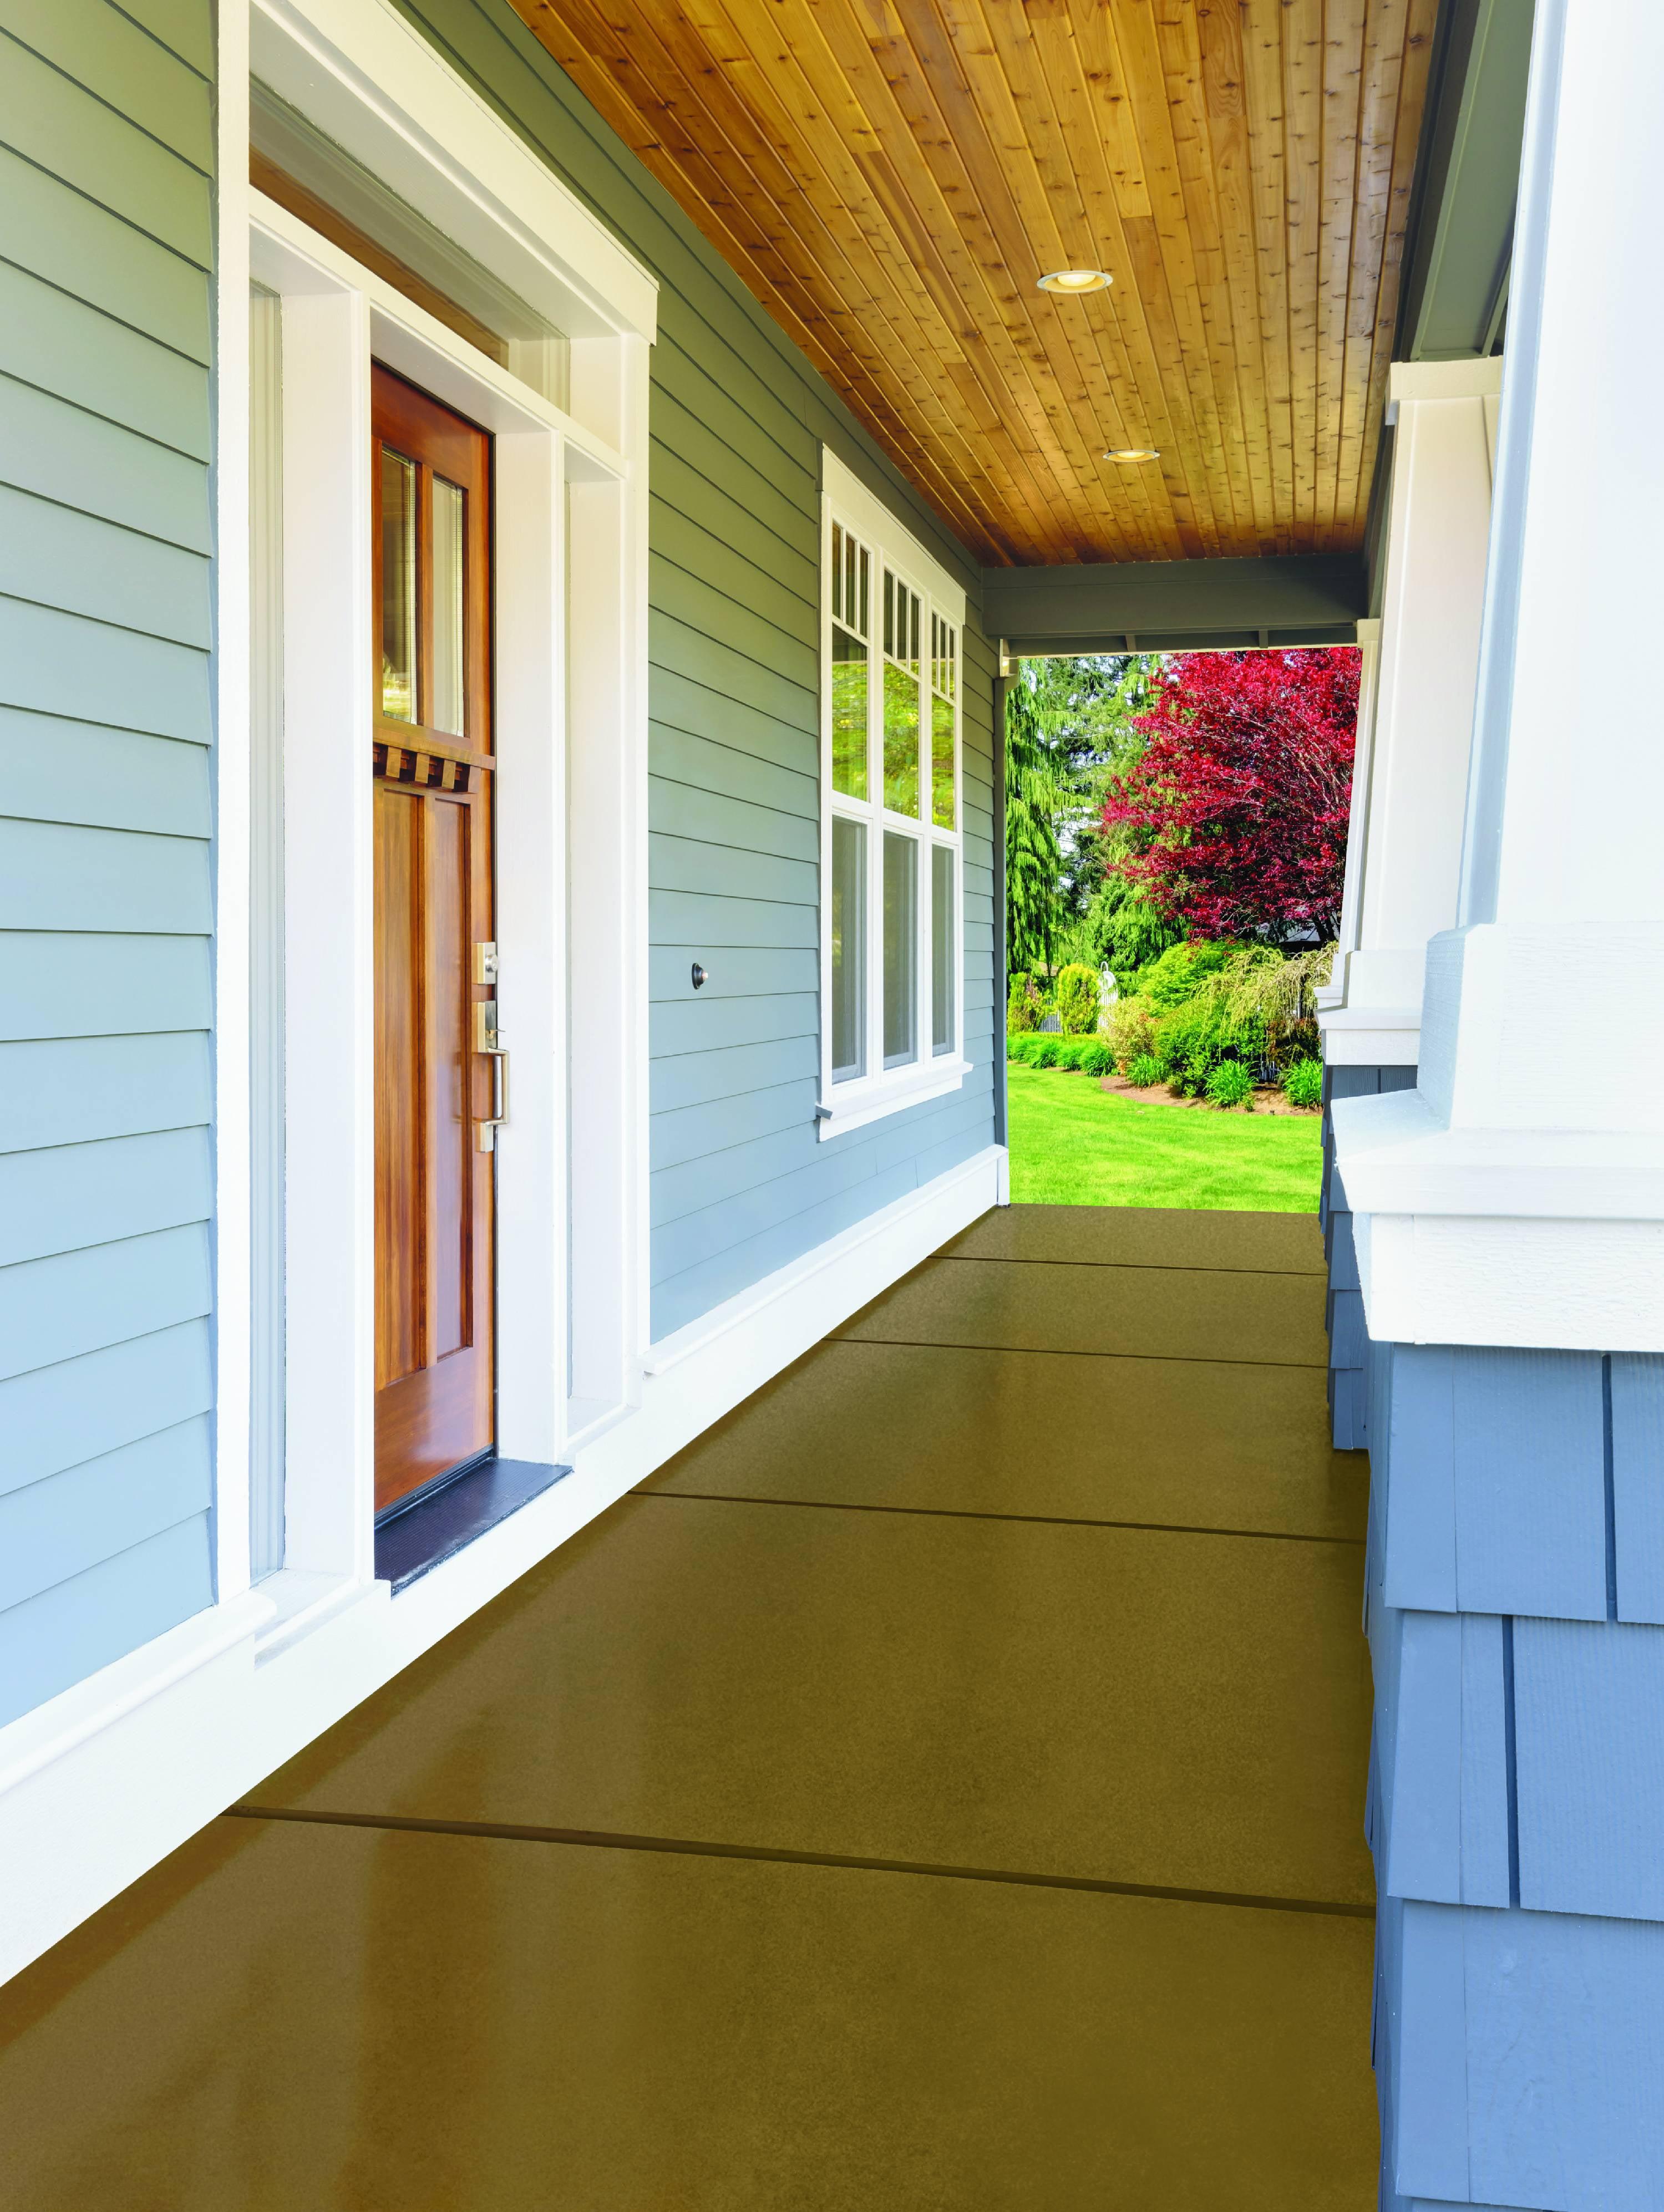 Glidden Porch Floor Paint And Primer Grab N Go Satin Finish Brown 1 Gallon